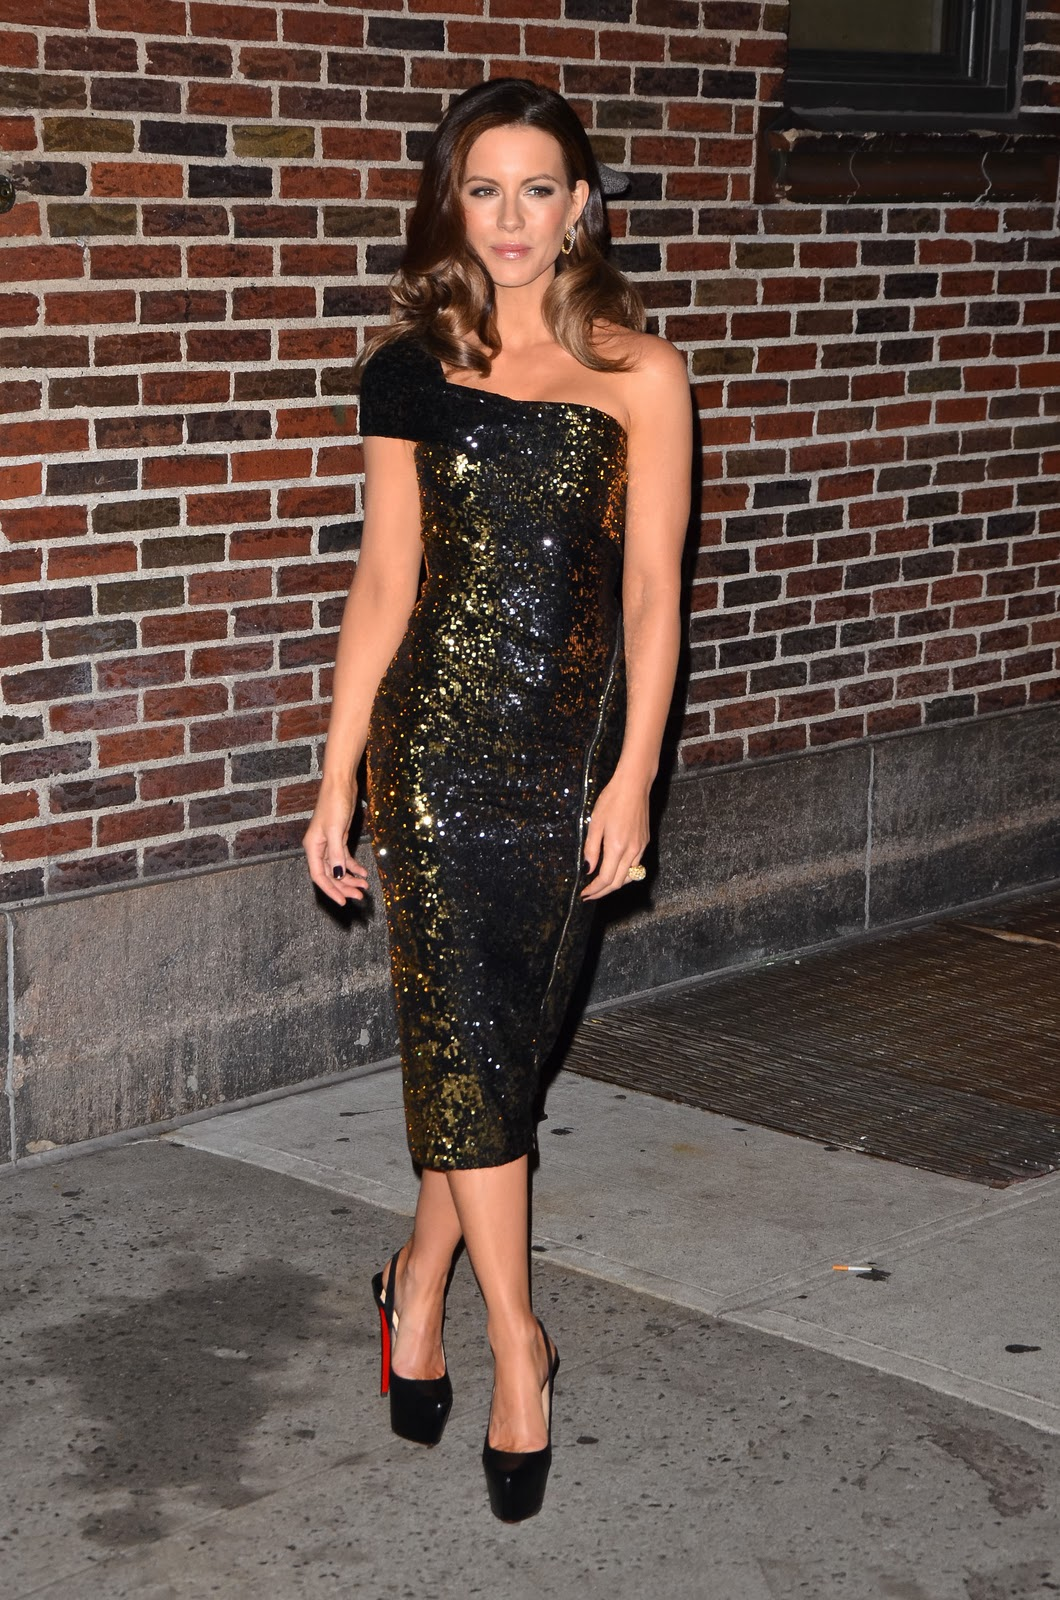 http://1.bp.blogspot.com/-EZvpk40sl44/TxI5mkK7J6I/AAAAAAAACcY/jSHfJyeNr5o/s1600/Kate+Beckinsale+Donna+Karan+Prefall+2012+dress.jpg